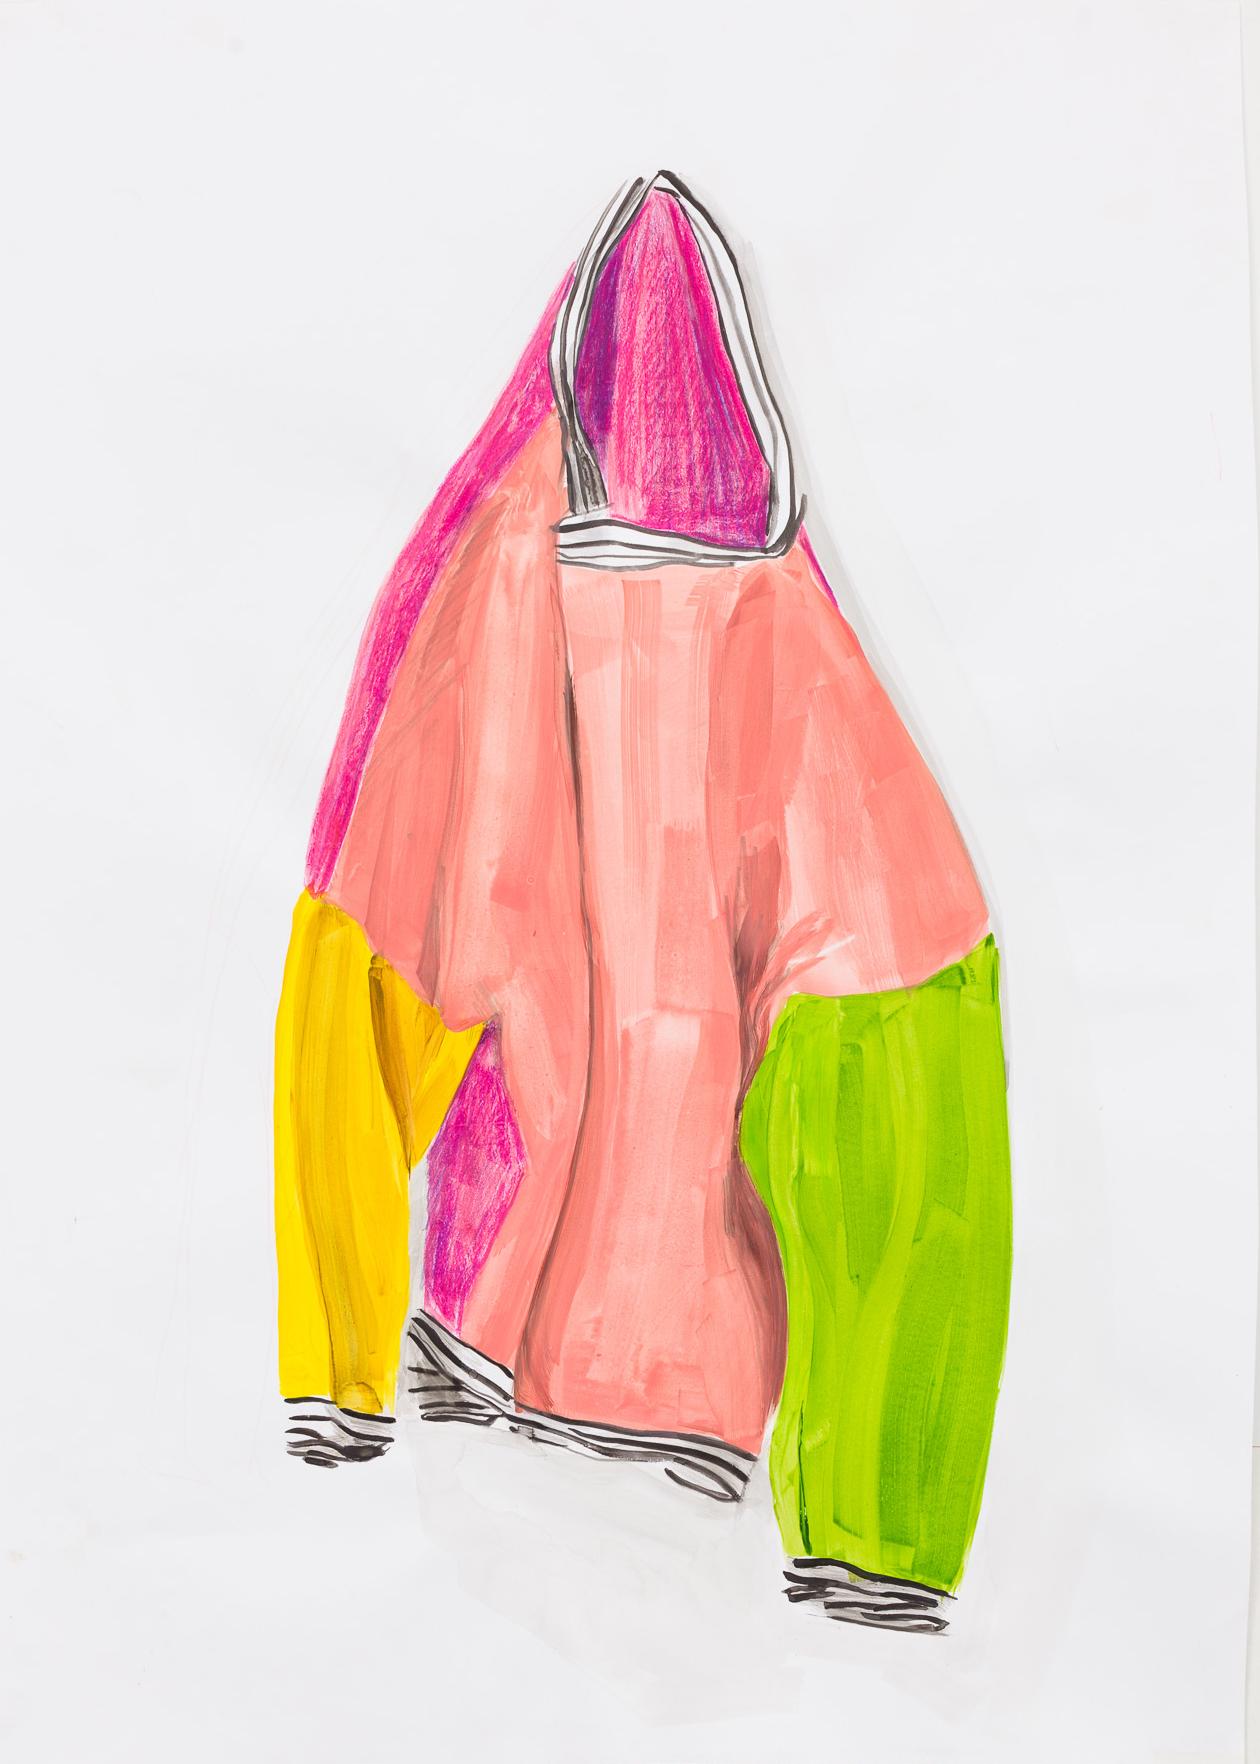 Britt Dorenbosch mijn kleurenleer trui roze kinderkleding